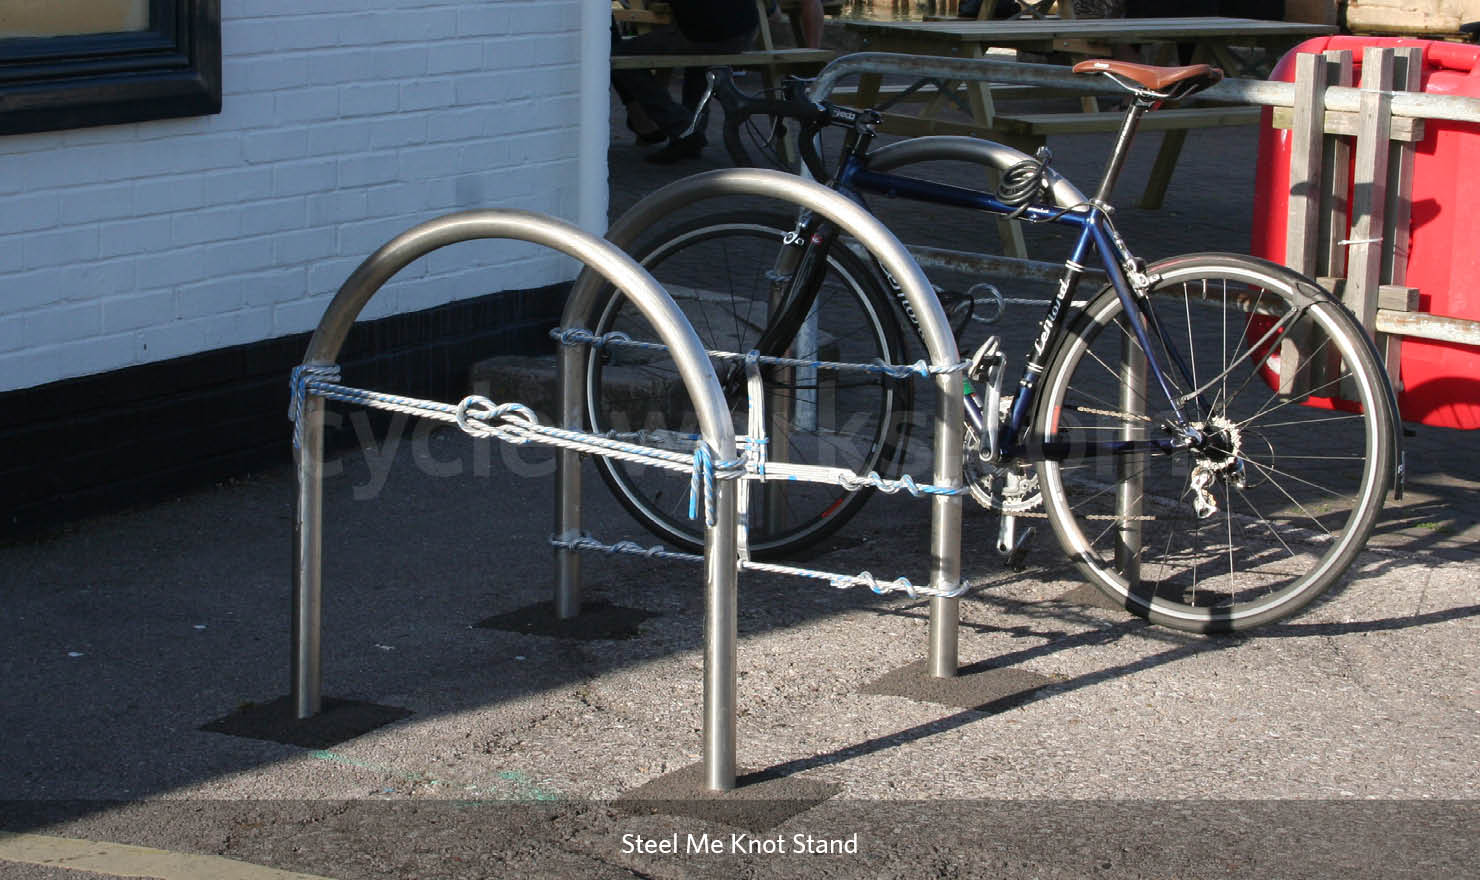 Steel Me Knot Bike Stand